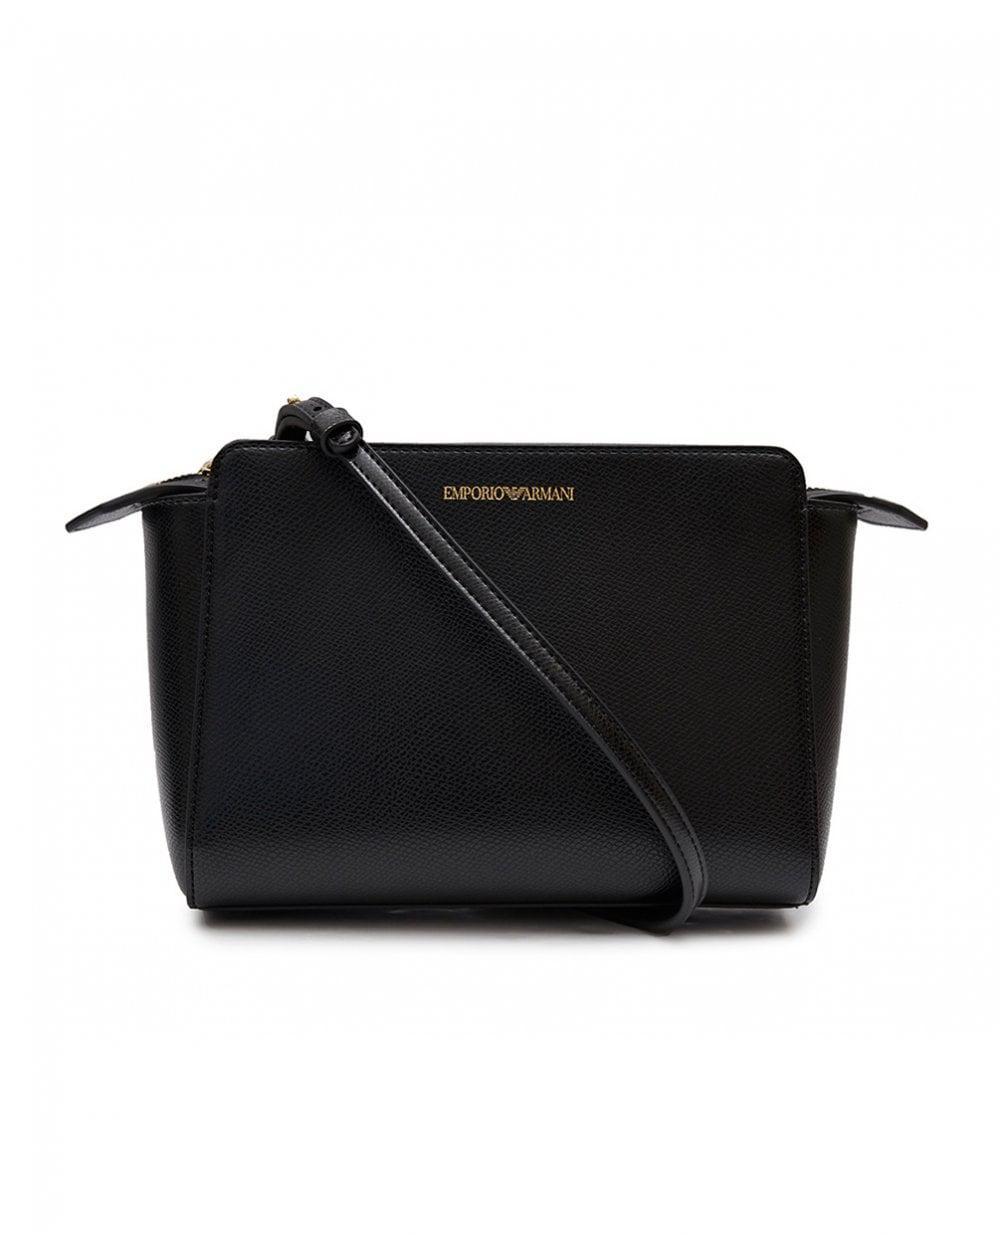 587ebaba23b4 Lyst - Emporio Armani Plain Cross Body Bag in Black